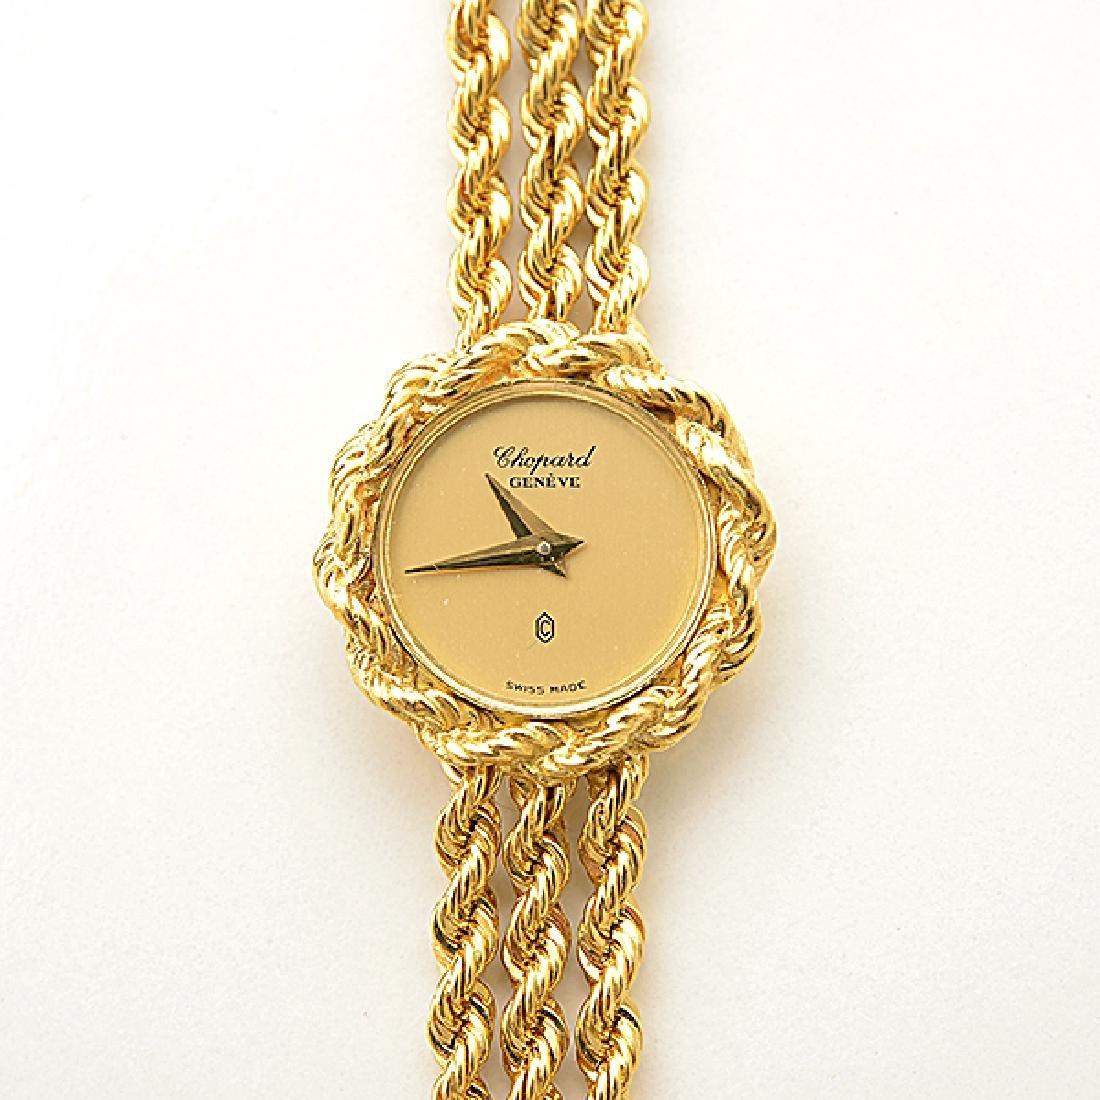 Ladies Chopard 18k Yellow Gold Wristwatch. - 2